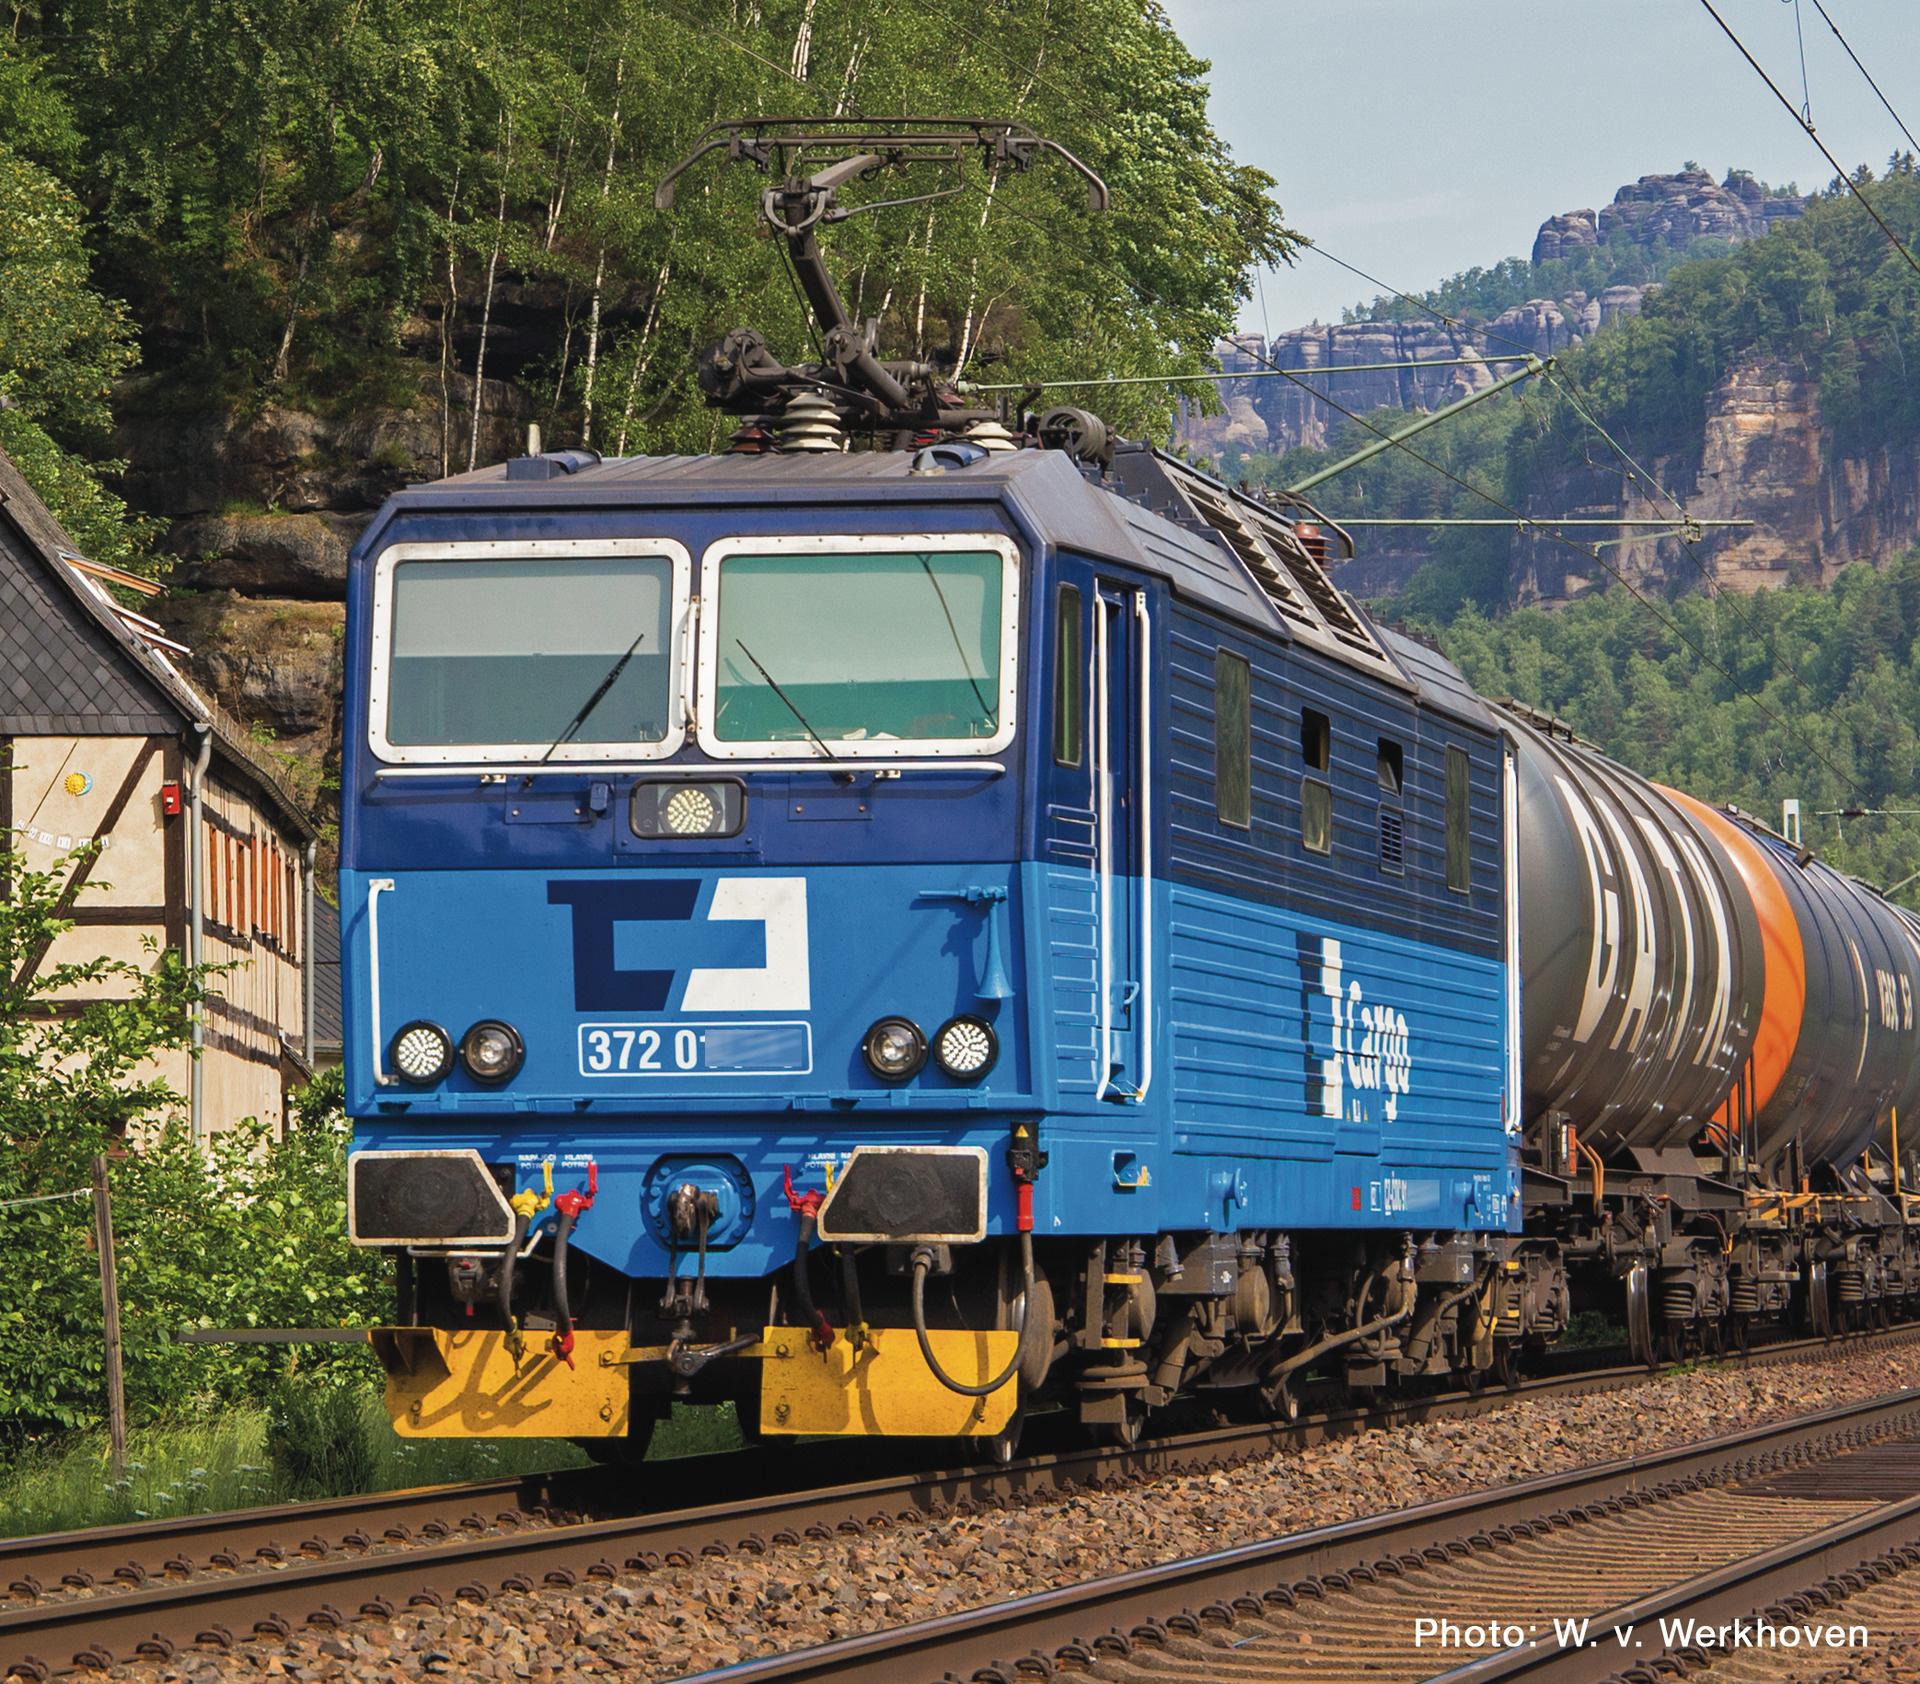 71226 E-Lok Rh 372 CD Cargo Snd.-1